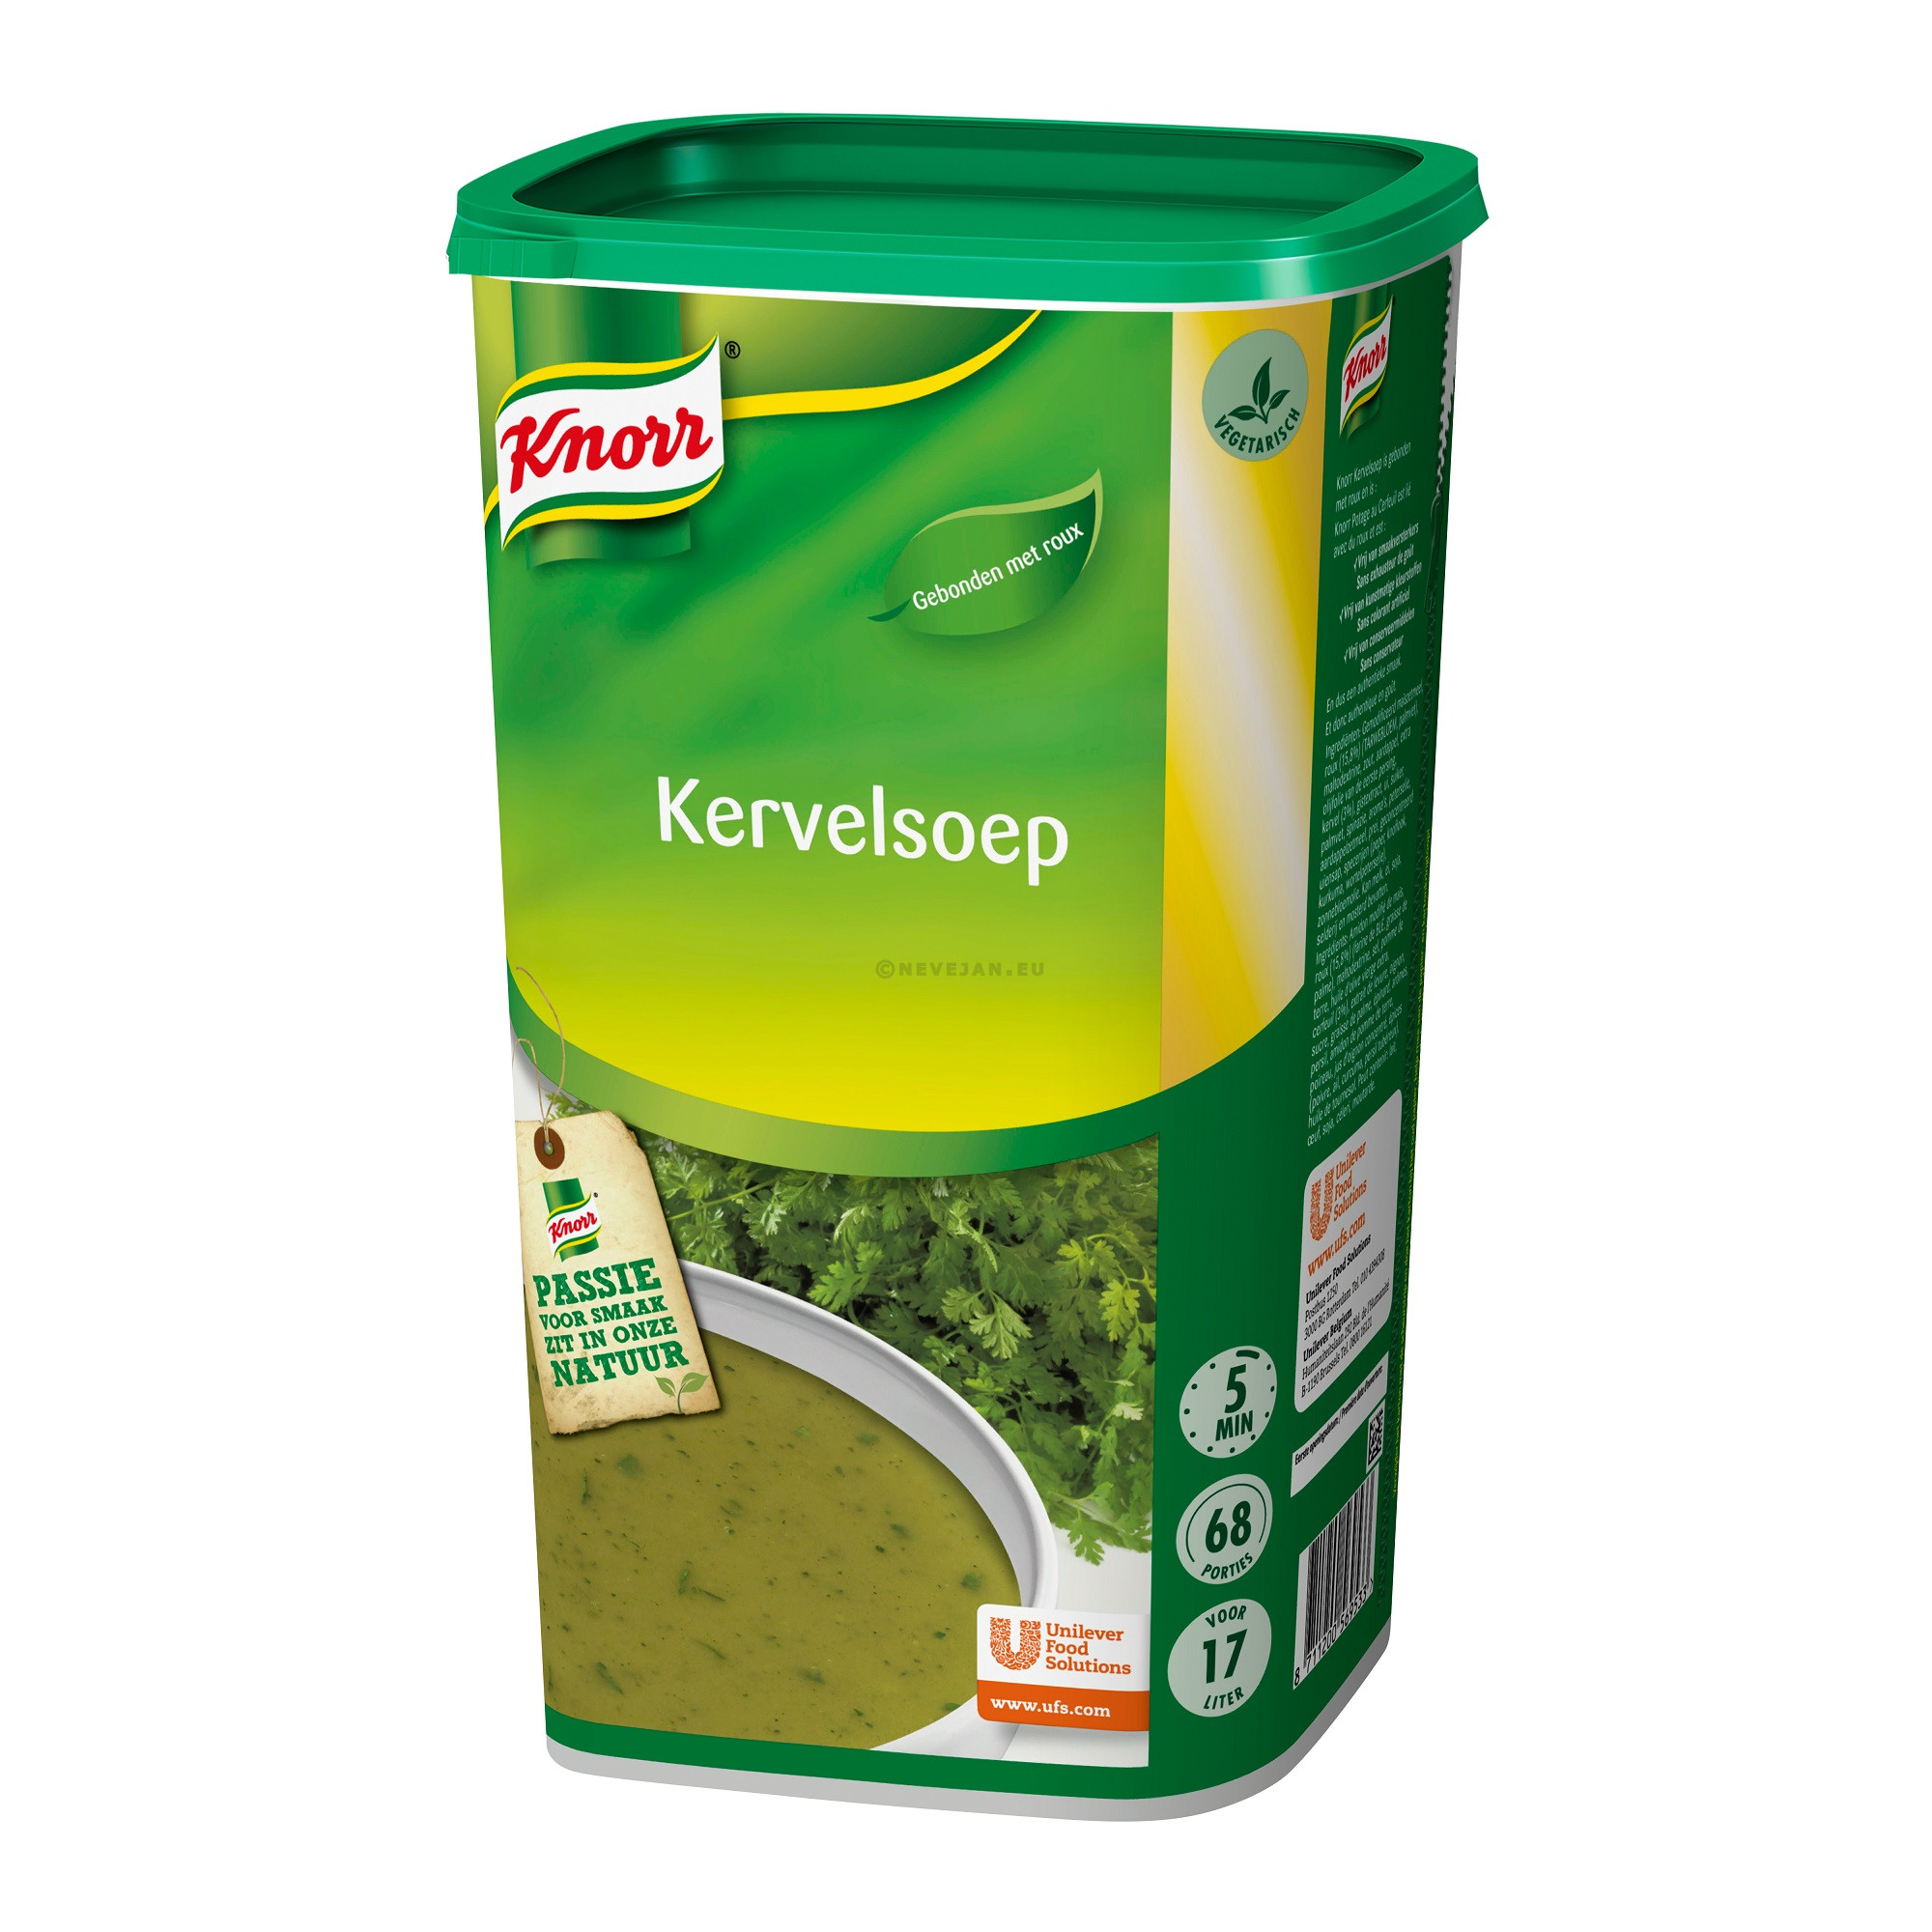 Knorr kervelsoep 1.365kg Dagsoep